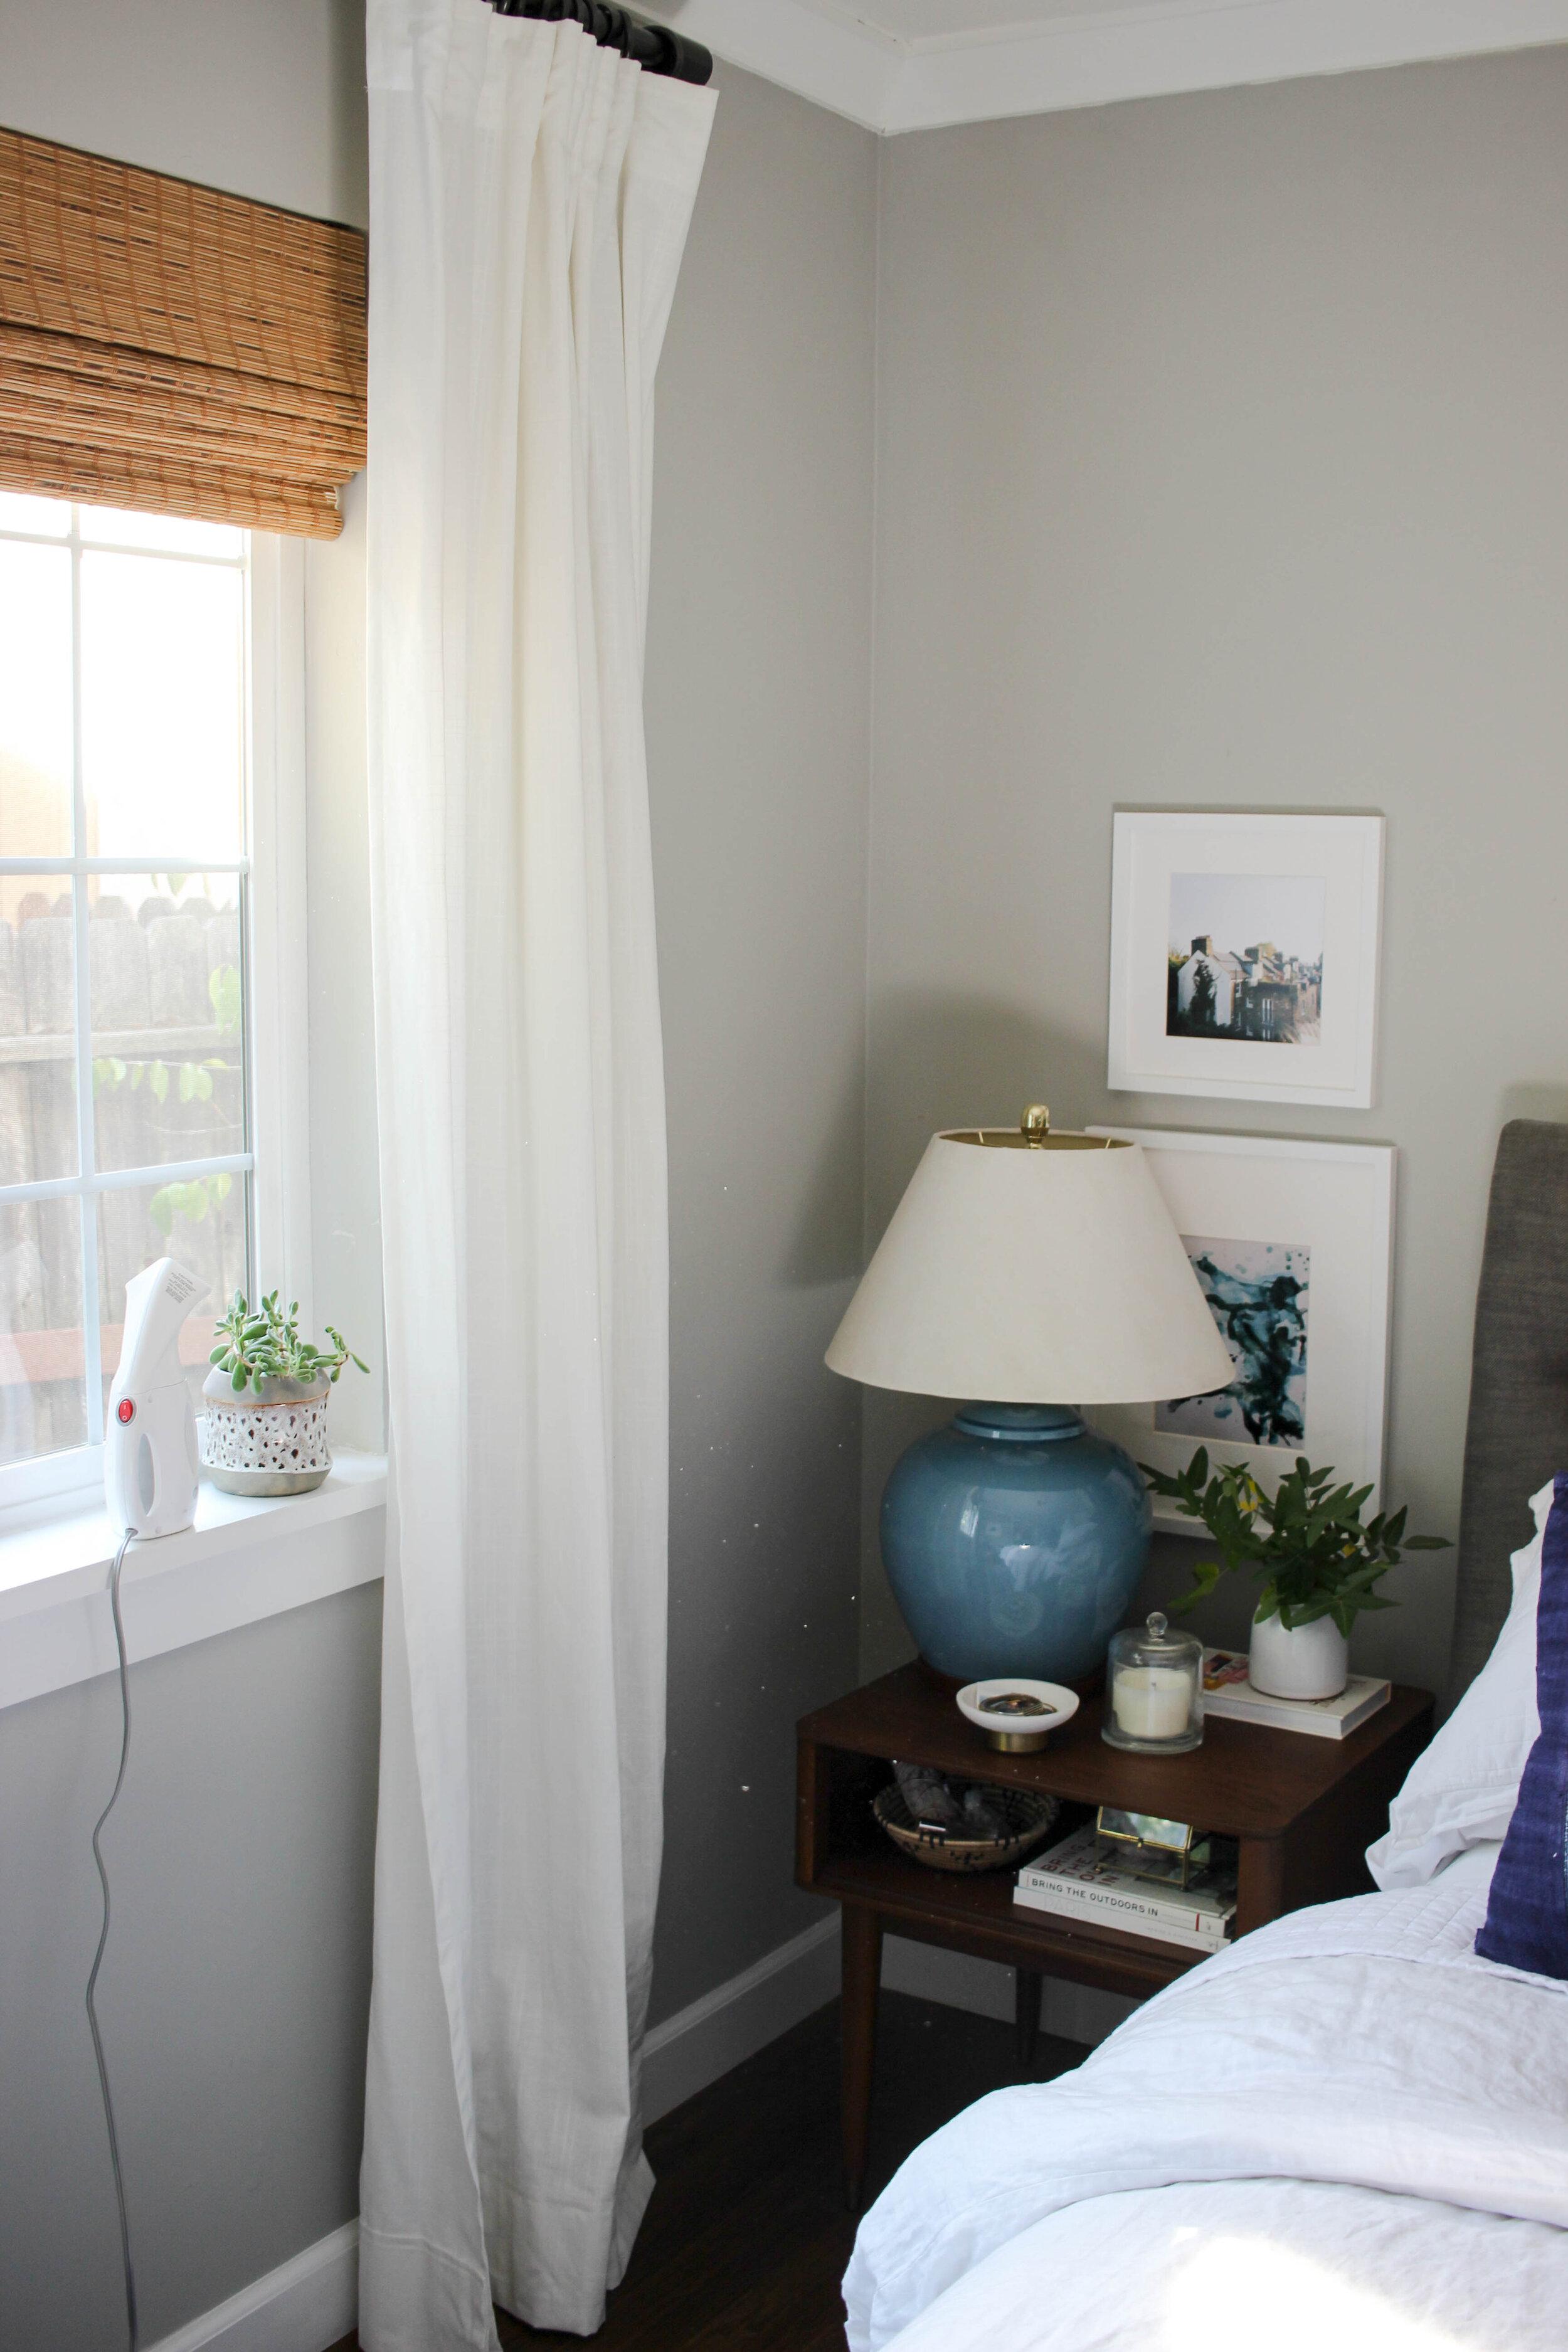 How To Elevate The Look Of Ikea Curtains Katrina Blair Interior Design Small Home Style Modern Livingkatrina Blair